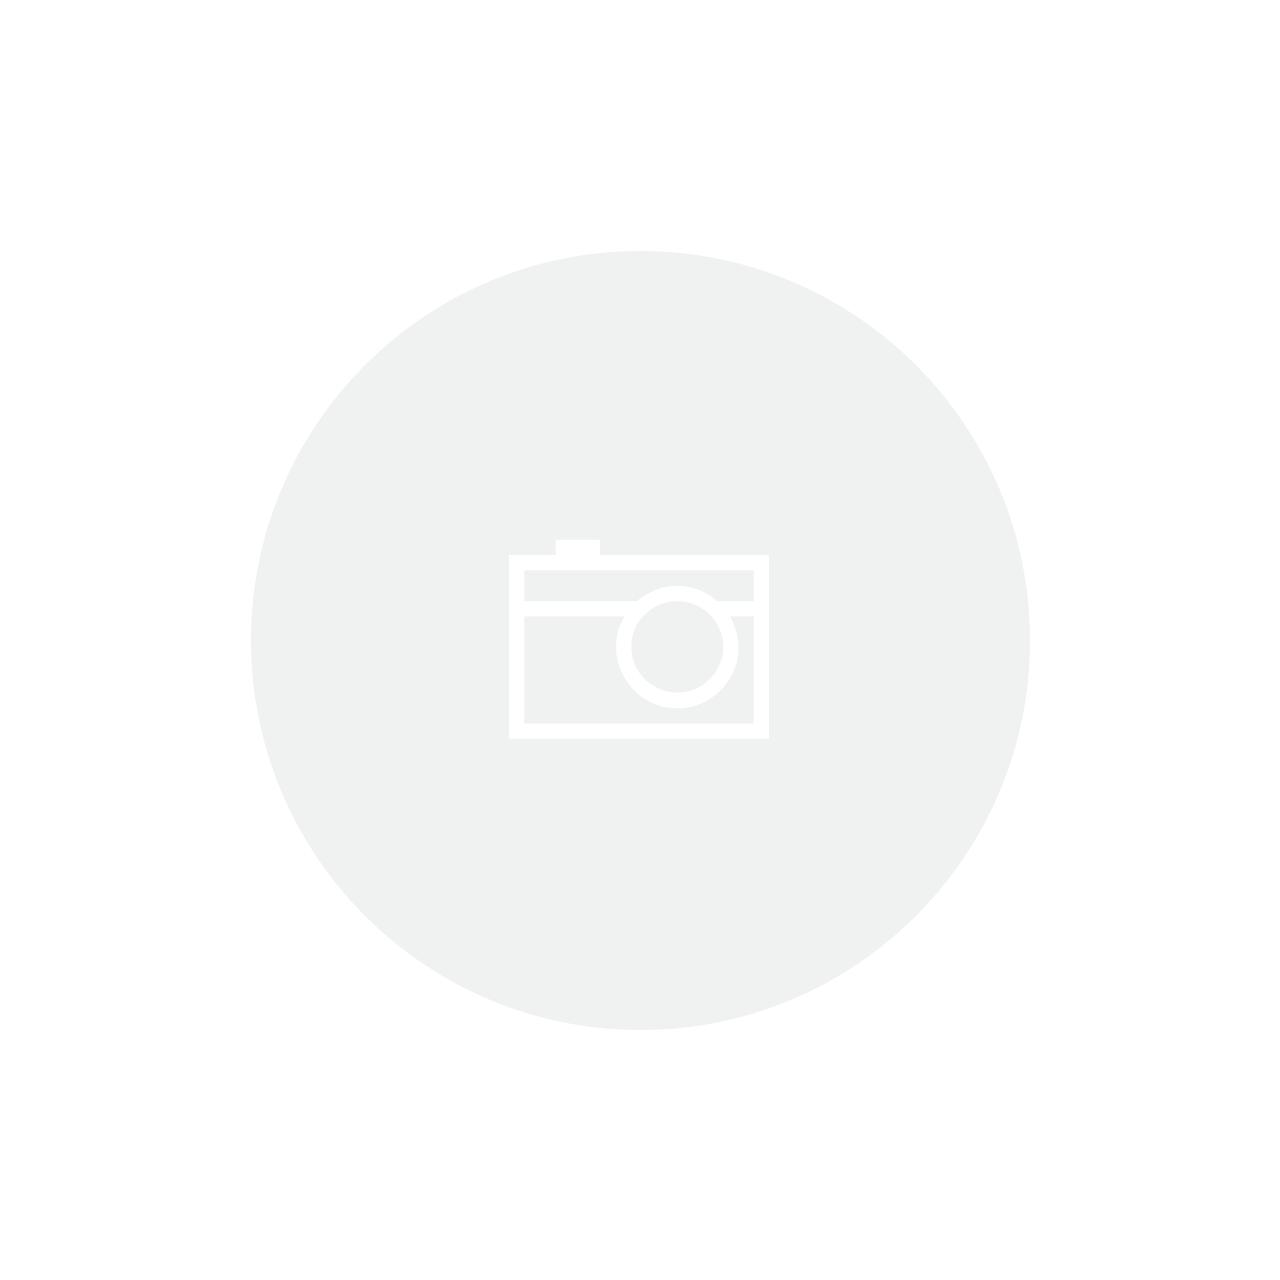 COROA 30D ICTUS NARROW WIDE ASSIMÉTRICA BCD 96mm (12V)